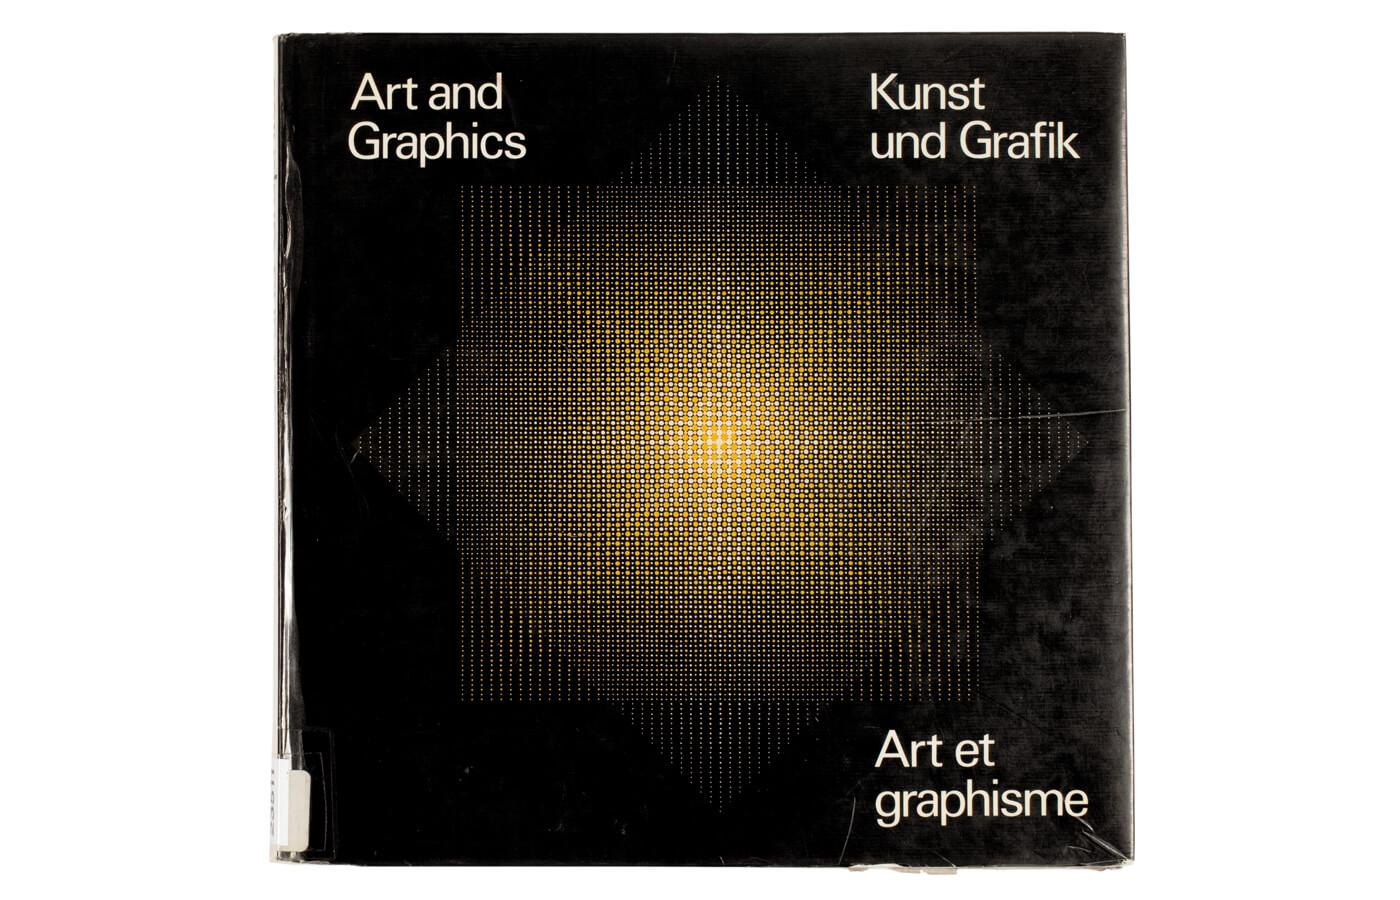 Art and Graphics | Kunst und Grafik | Art et graphisme